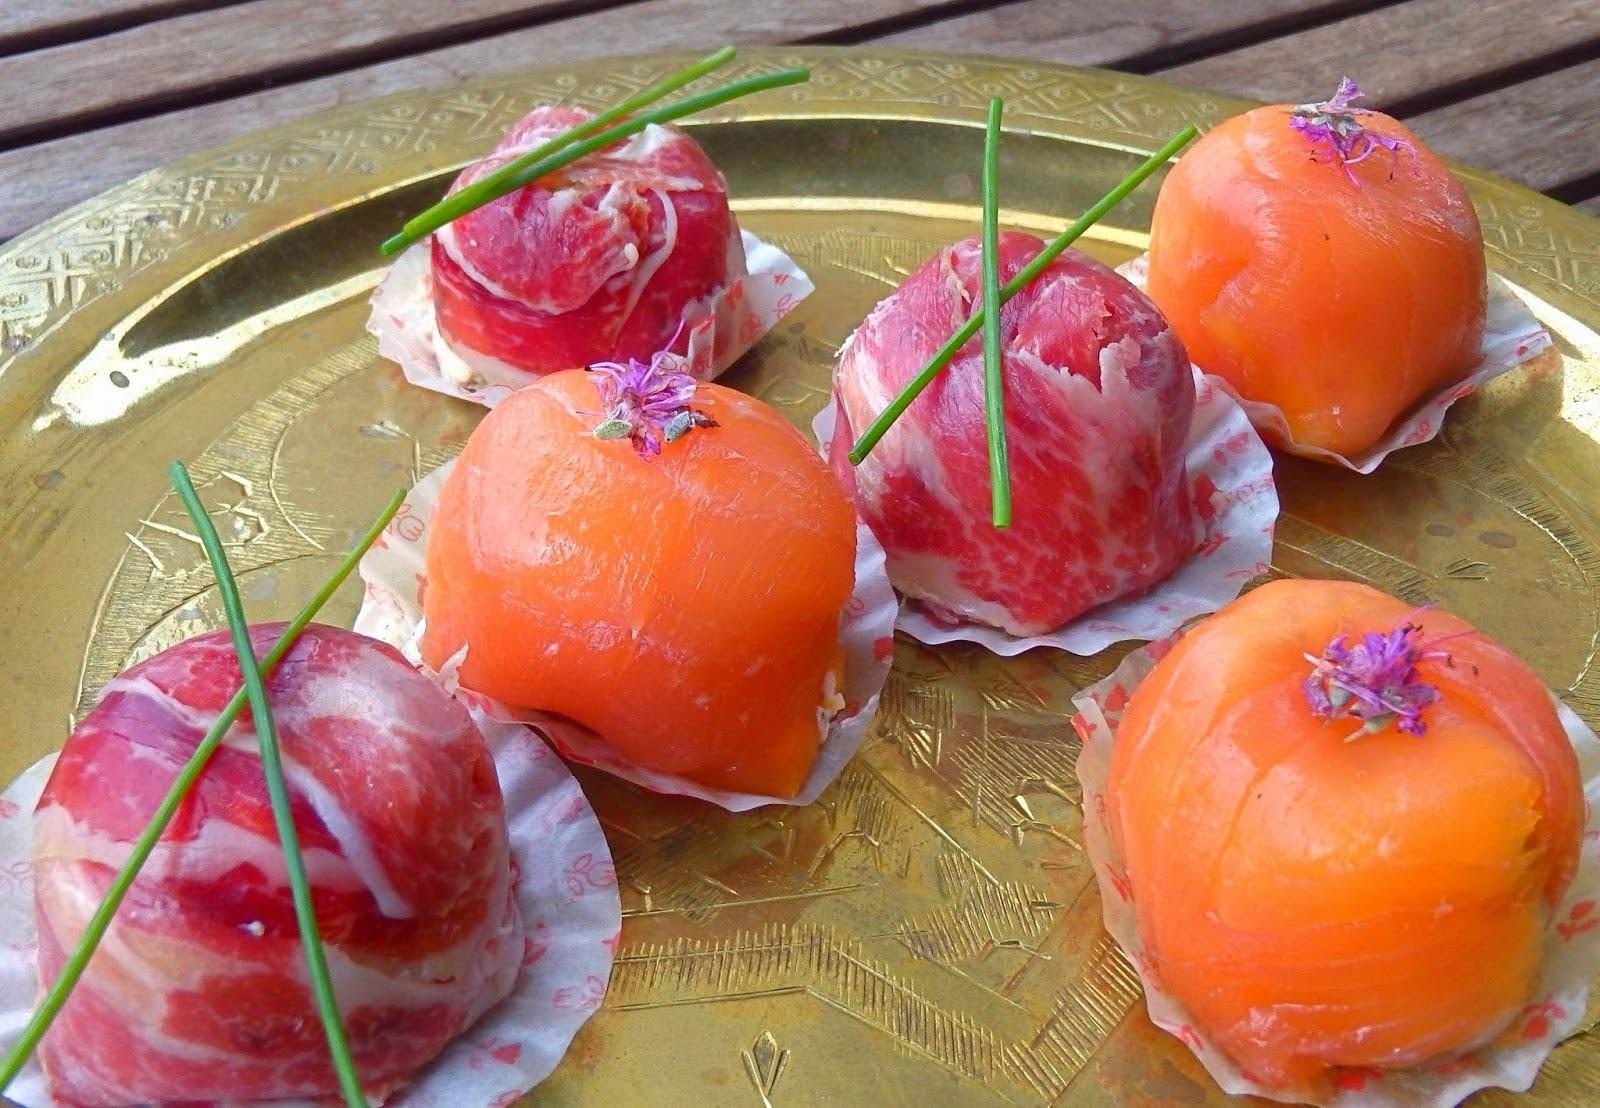 Aperitiu de Nadal: Bombons de salmò fumat - Aperitivo de Navidad: bombones de salmón ahumado